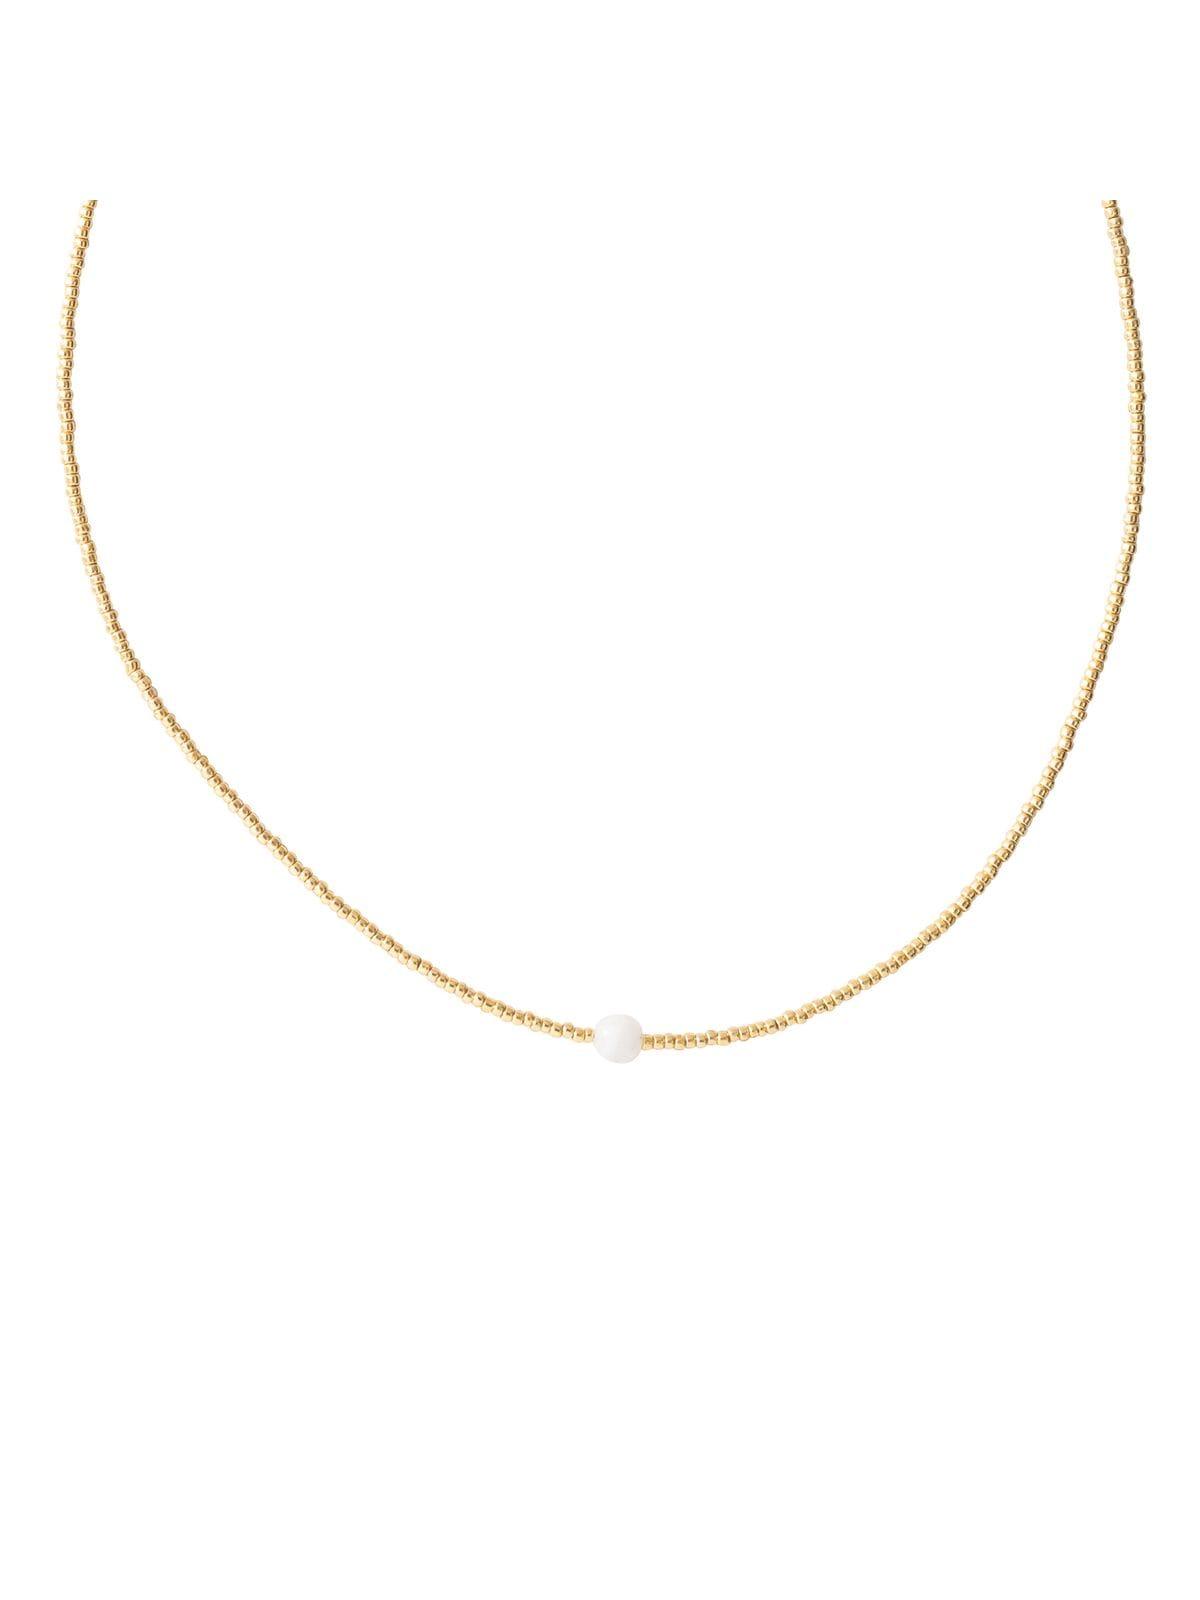 BL24280_1 - Flora Moonstone Gold Necklace_1200x1600